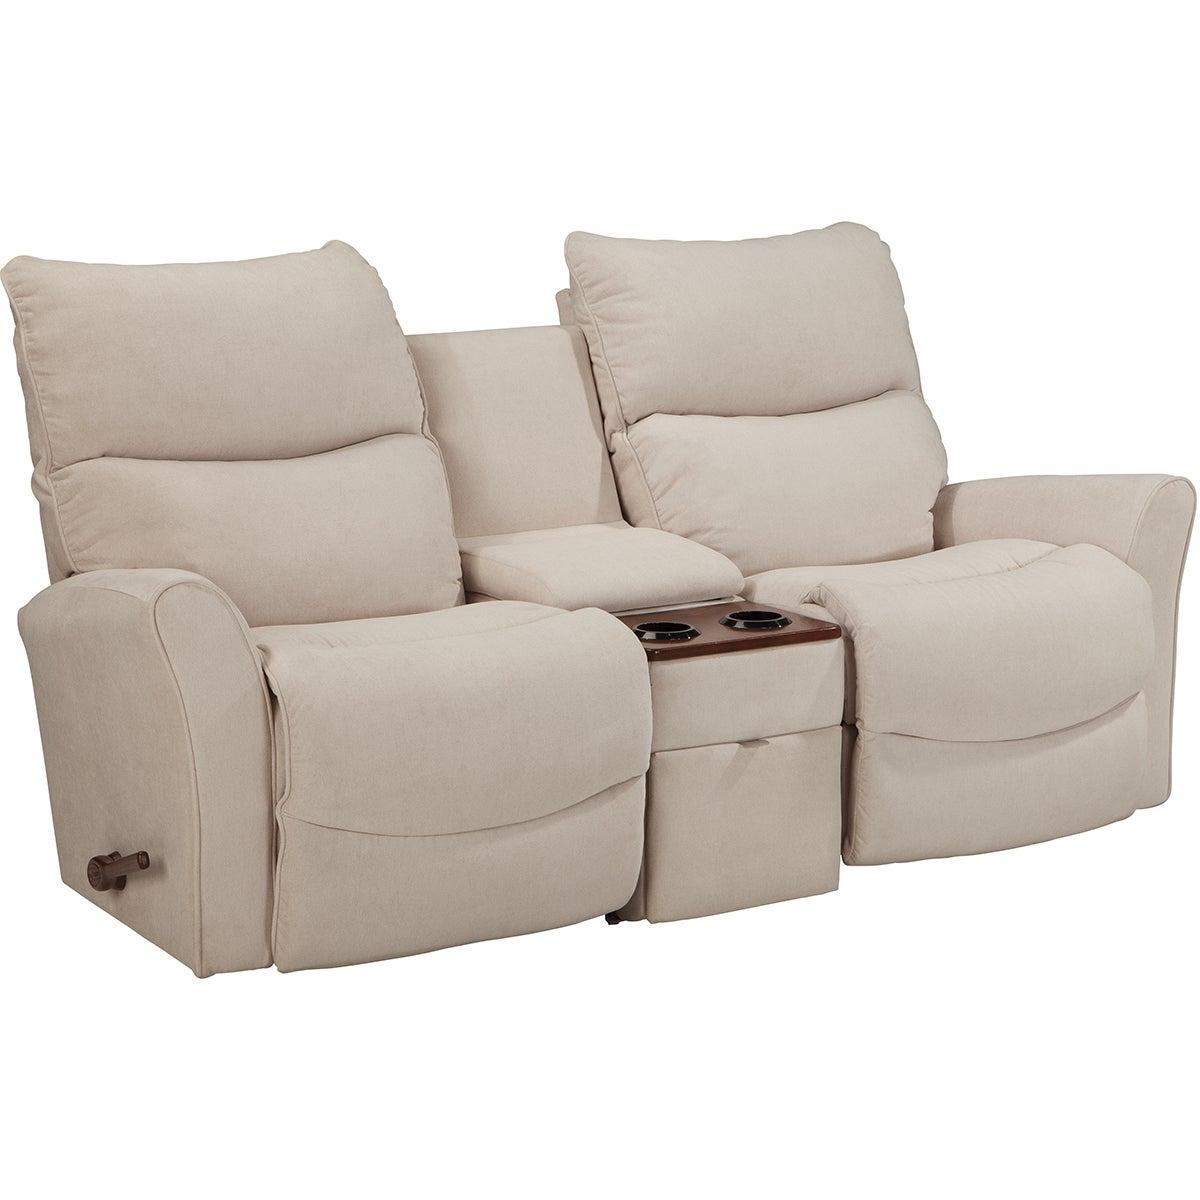 Leather Sectional Sofa Lazy Boy: Rowan Loveseat